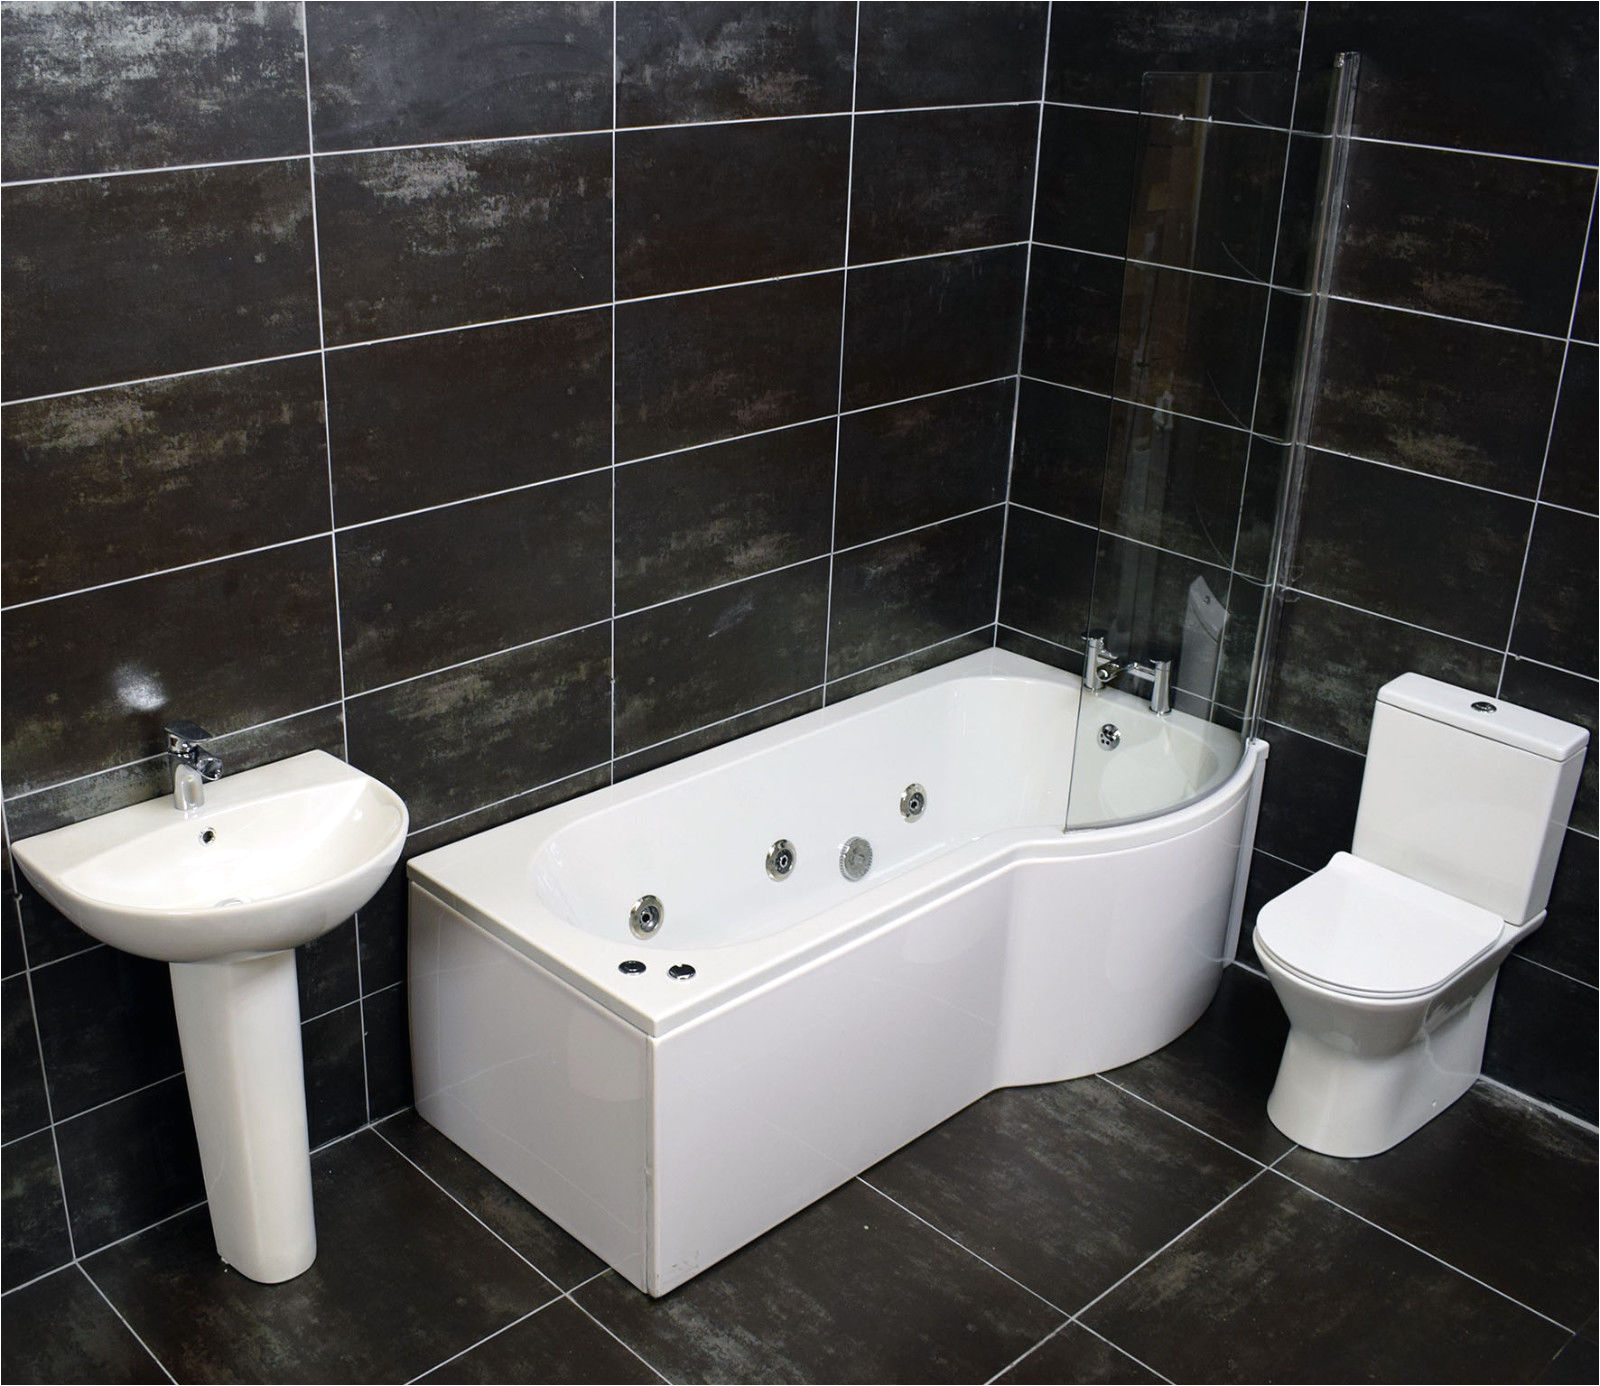 pact shower bath suite bathroom inc screen taps whirlpool jacuzzi option